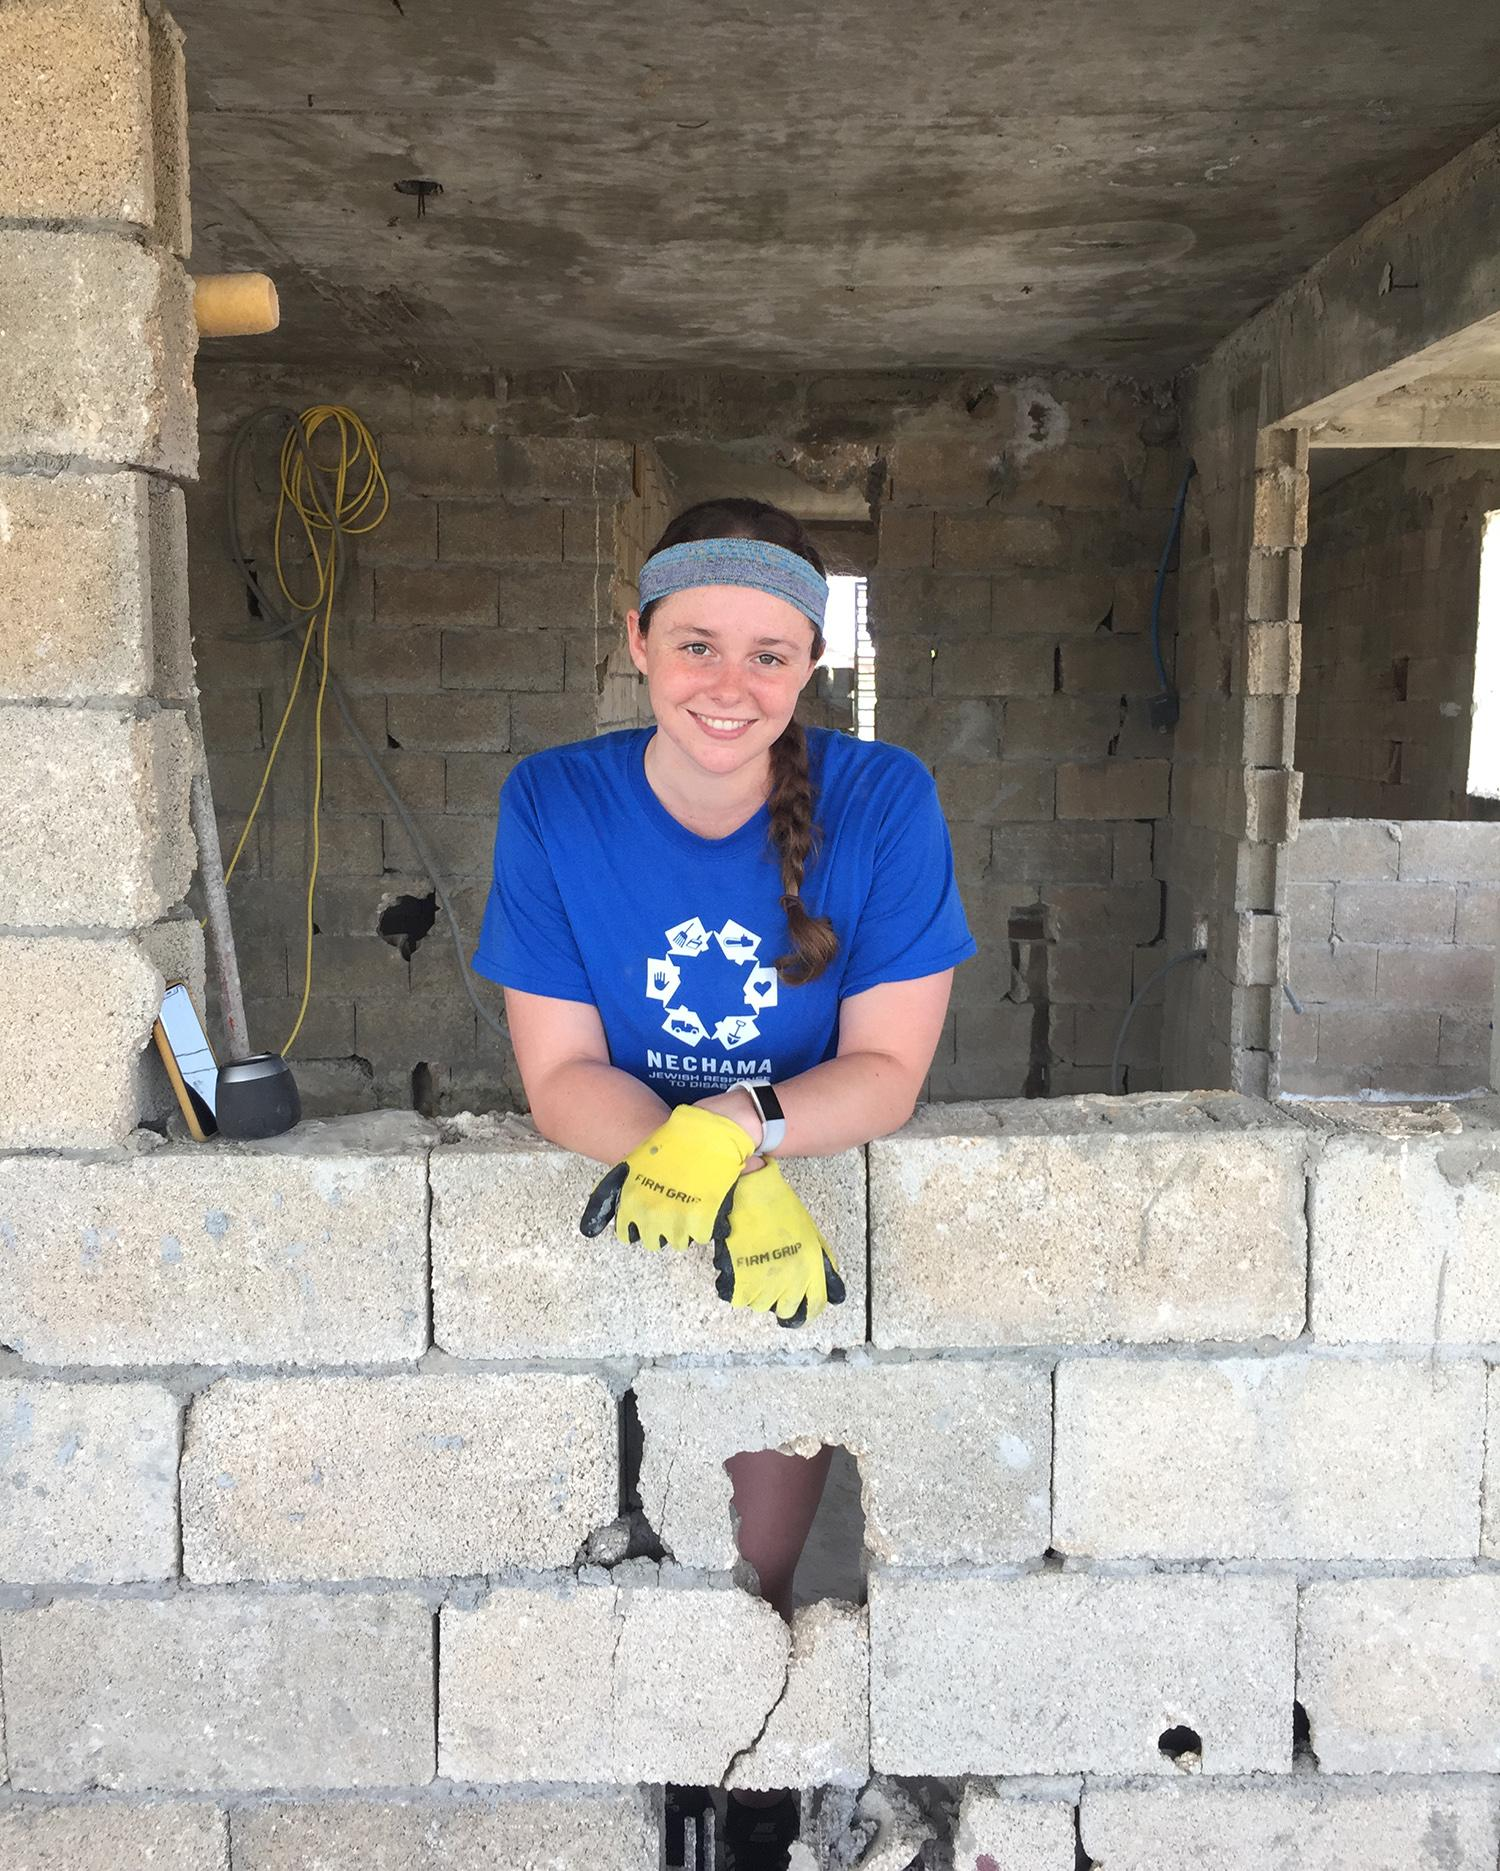 Chanel Meyer volunteering in Puerto Rico